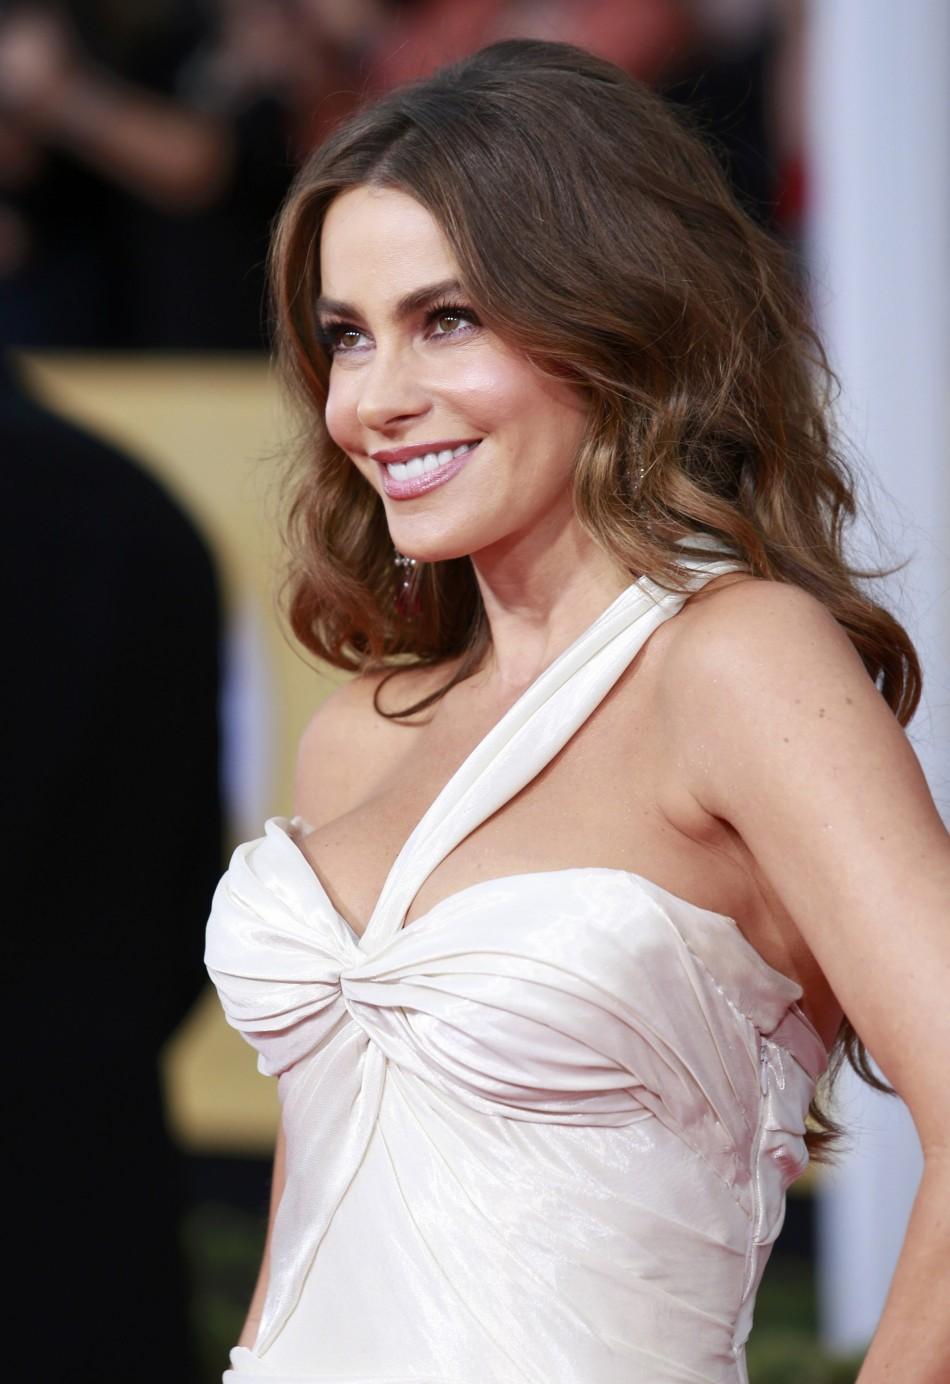 sofia vergara actress arrives - photo #22